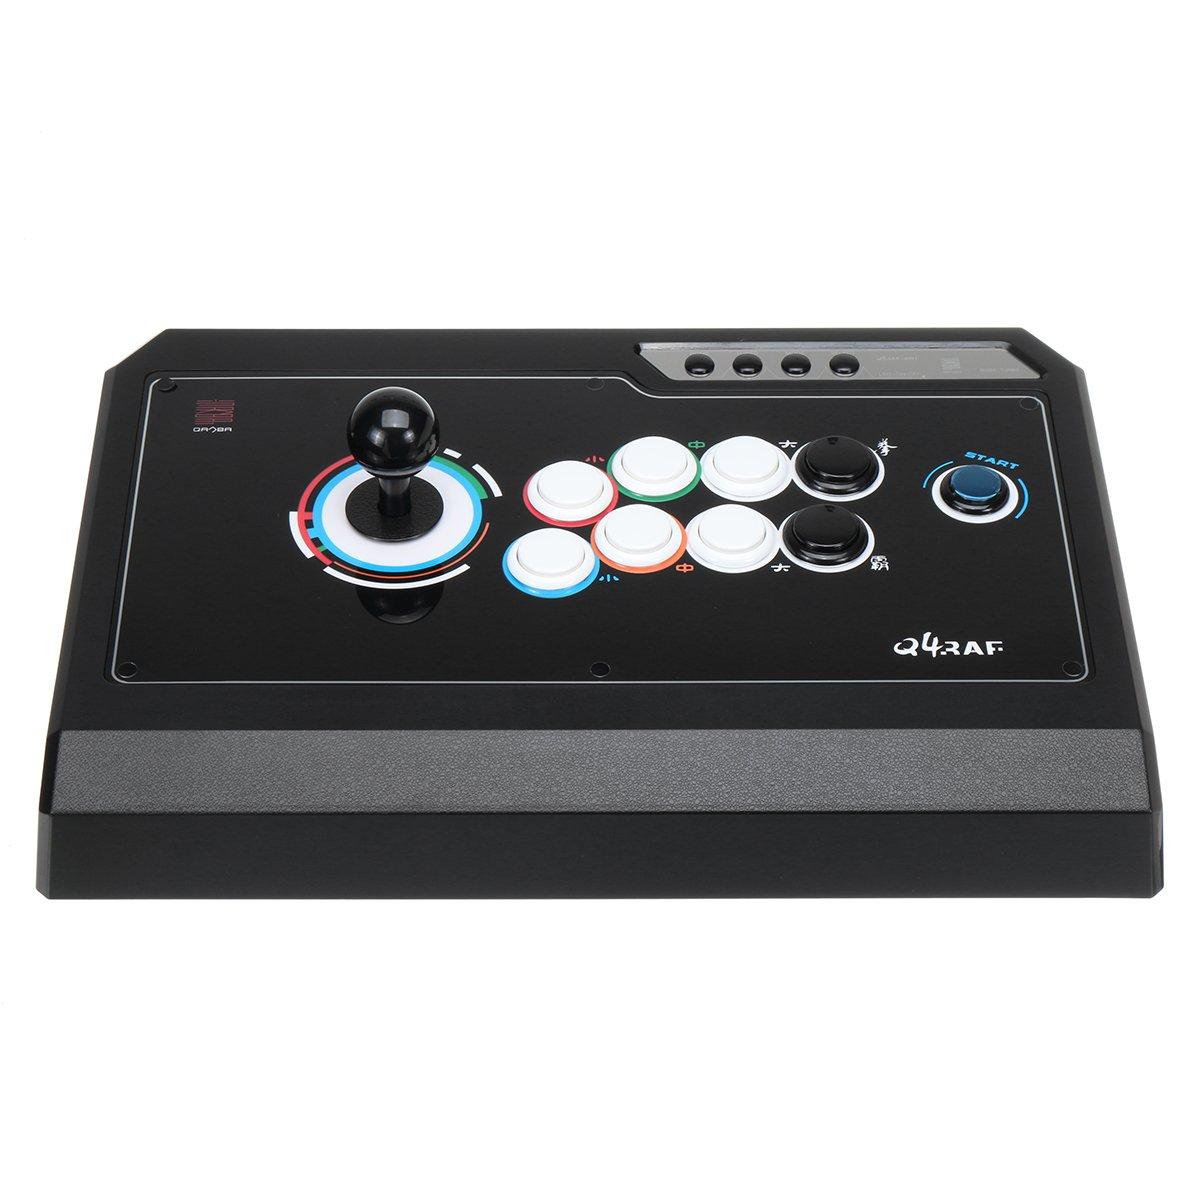 Q4-S3 Joystick Fighting Stick Gamepad Video Game Arcade ...